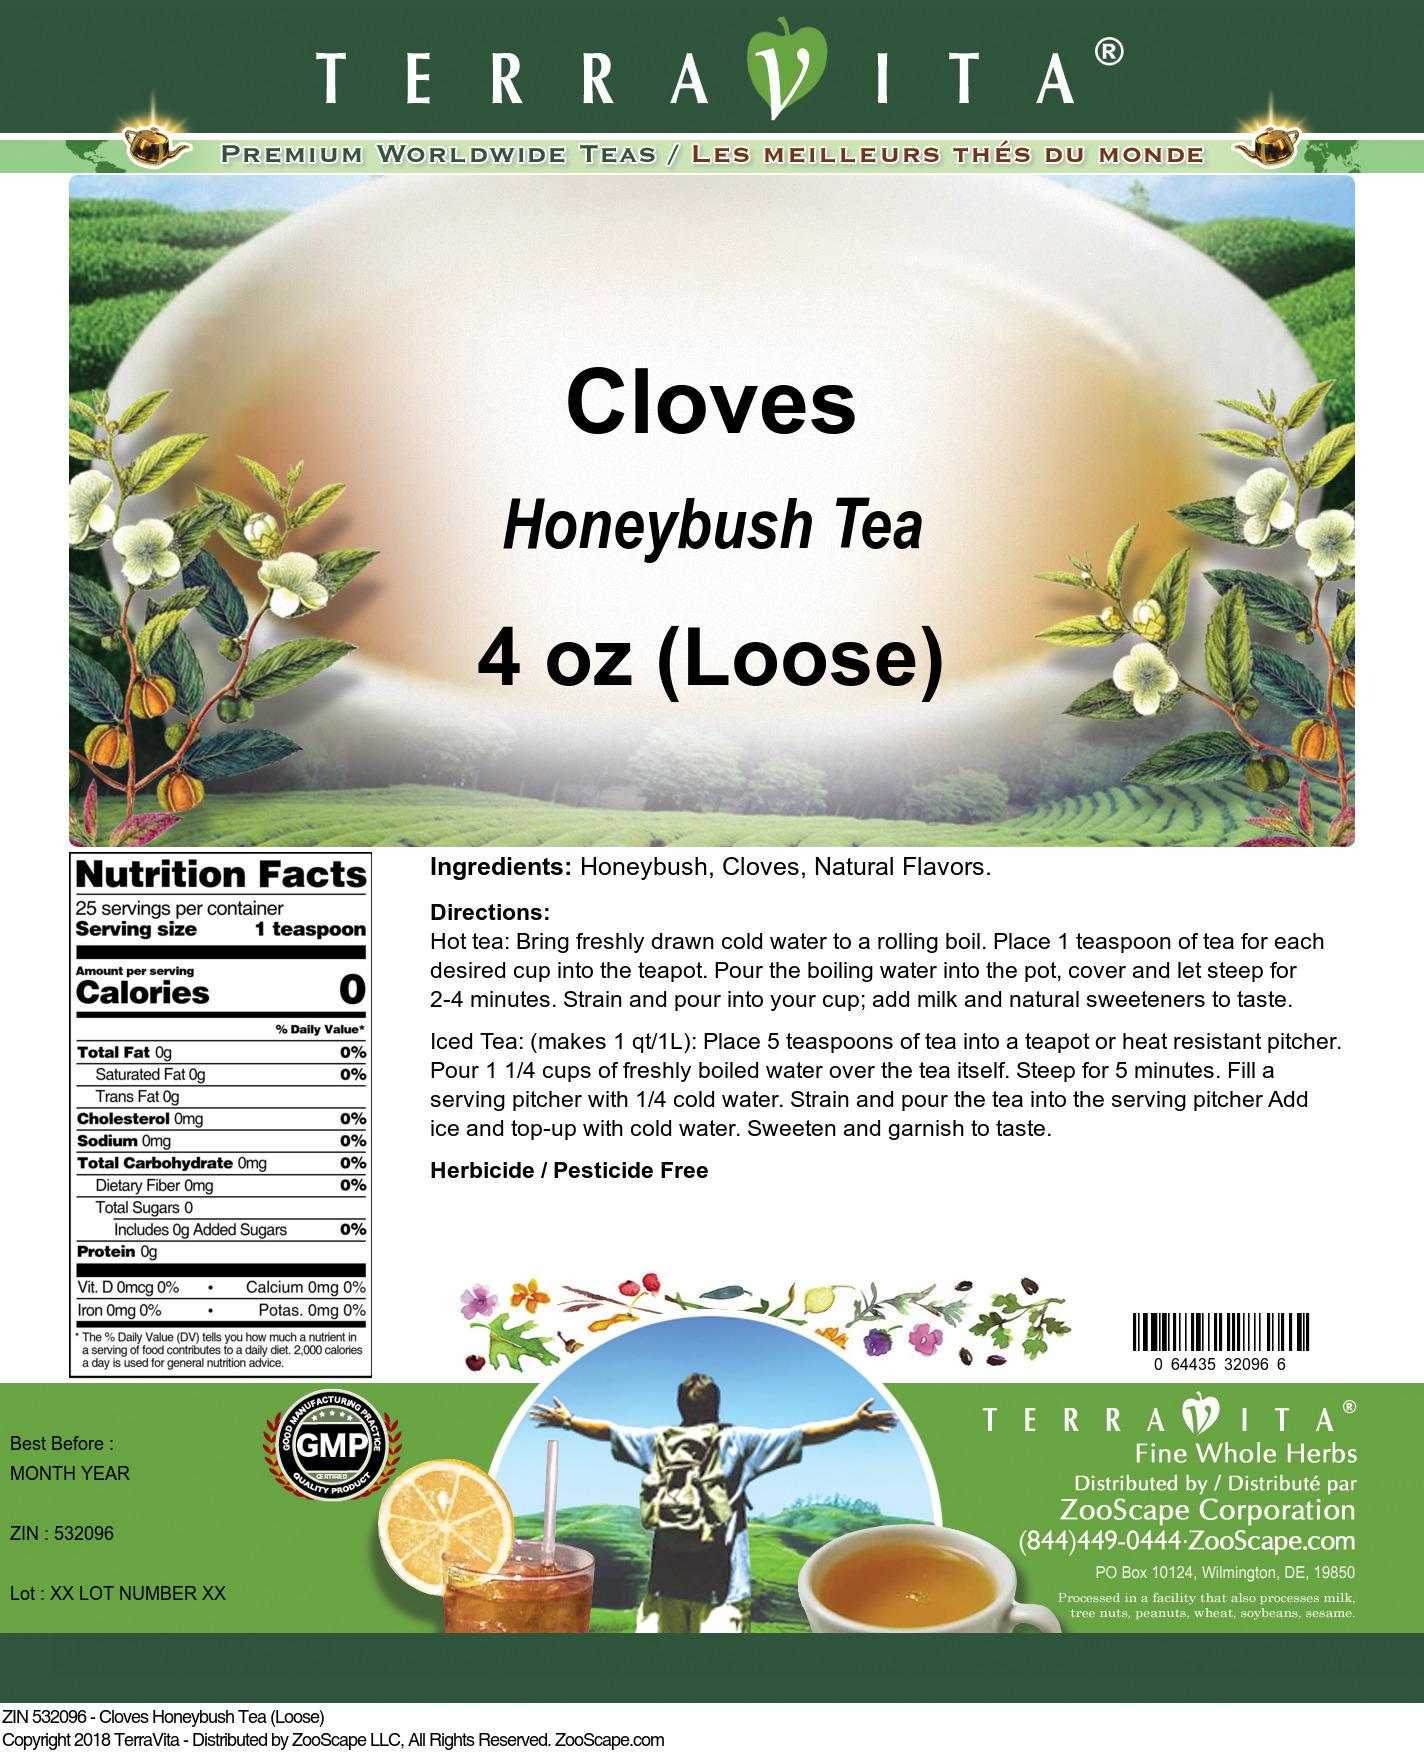 Cloves Honeybush Tea (Loose)